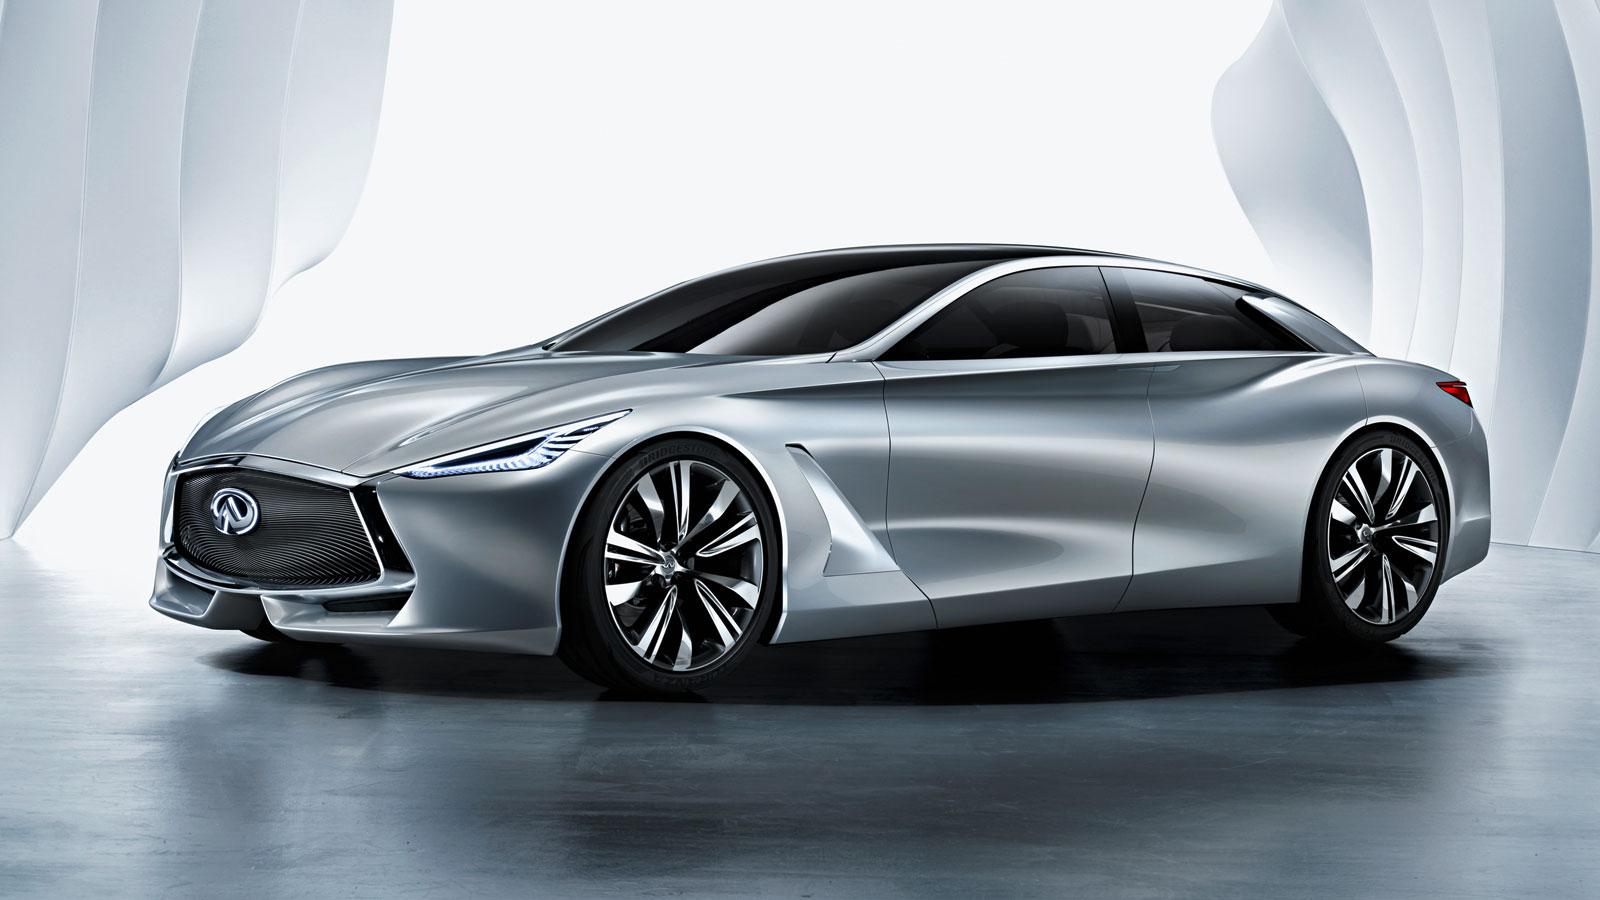 Infiniti Q80 Inspiration Concept Car Body Design